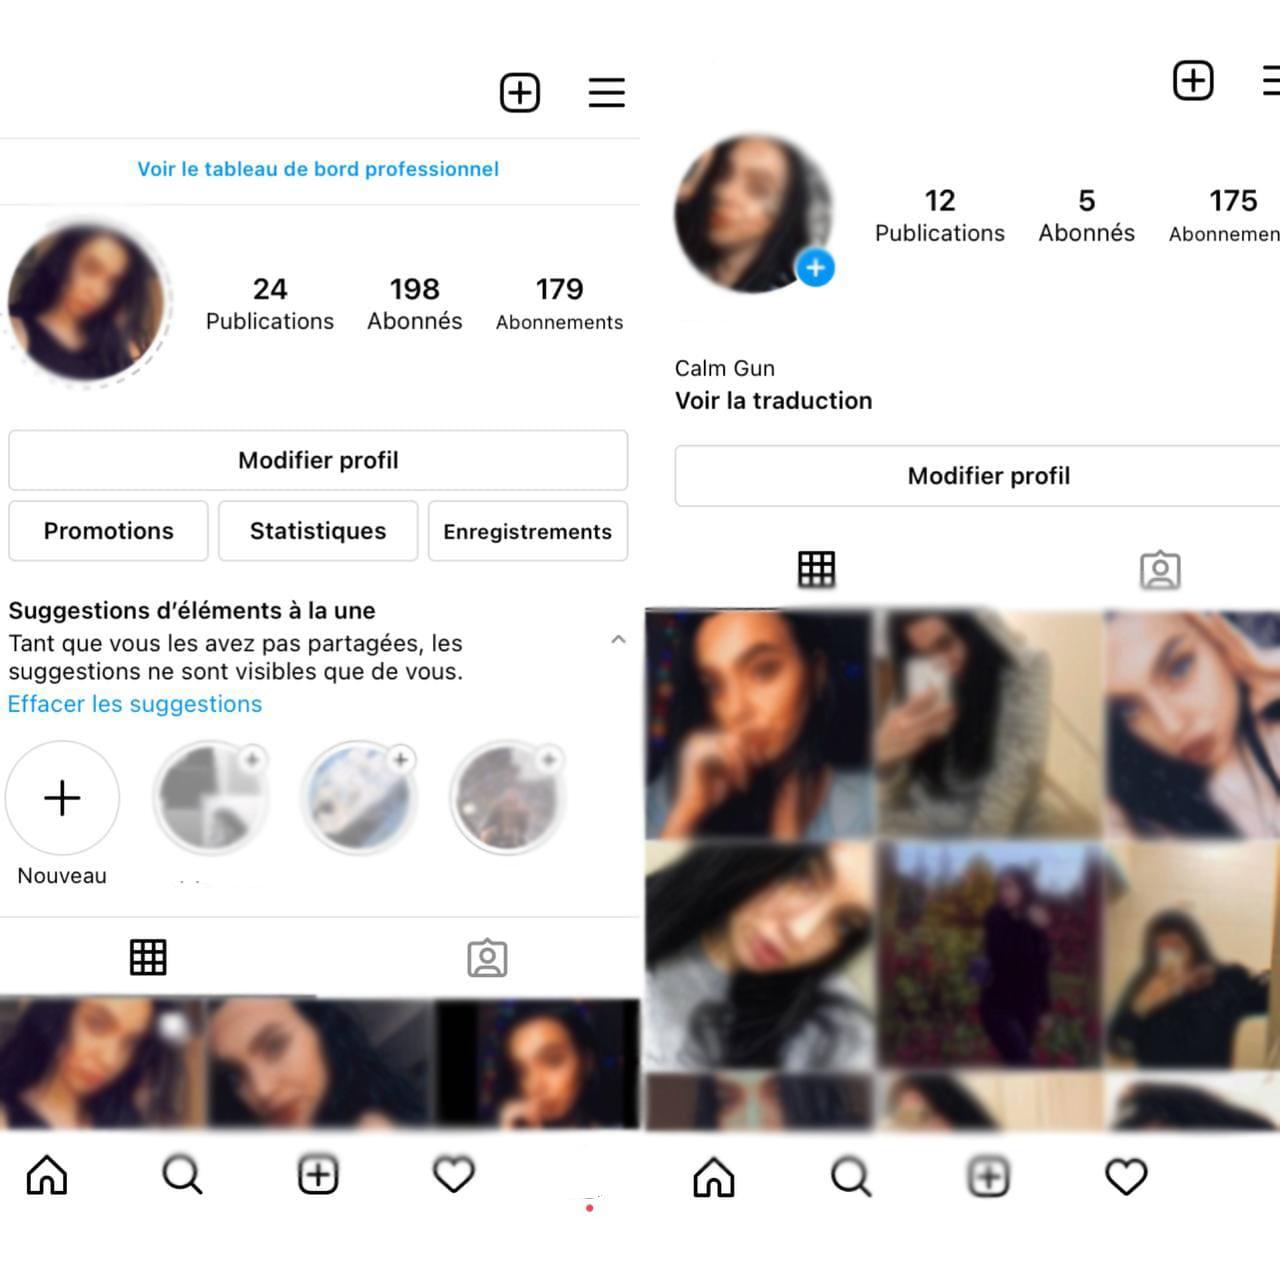 Compte professionnel Instagram vs compte personnel